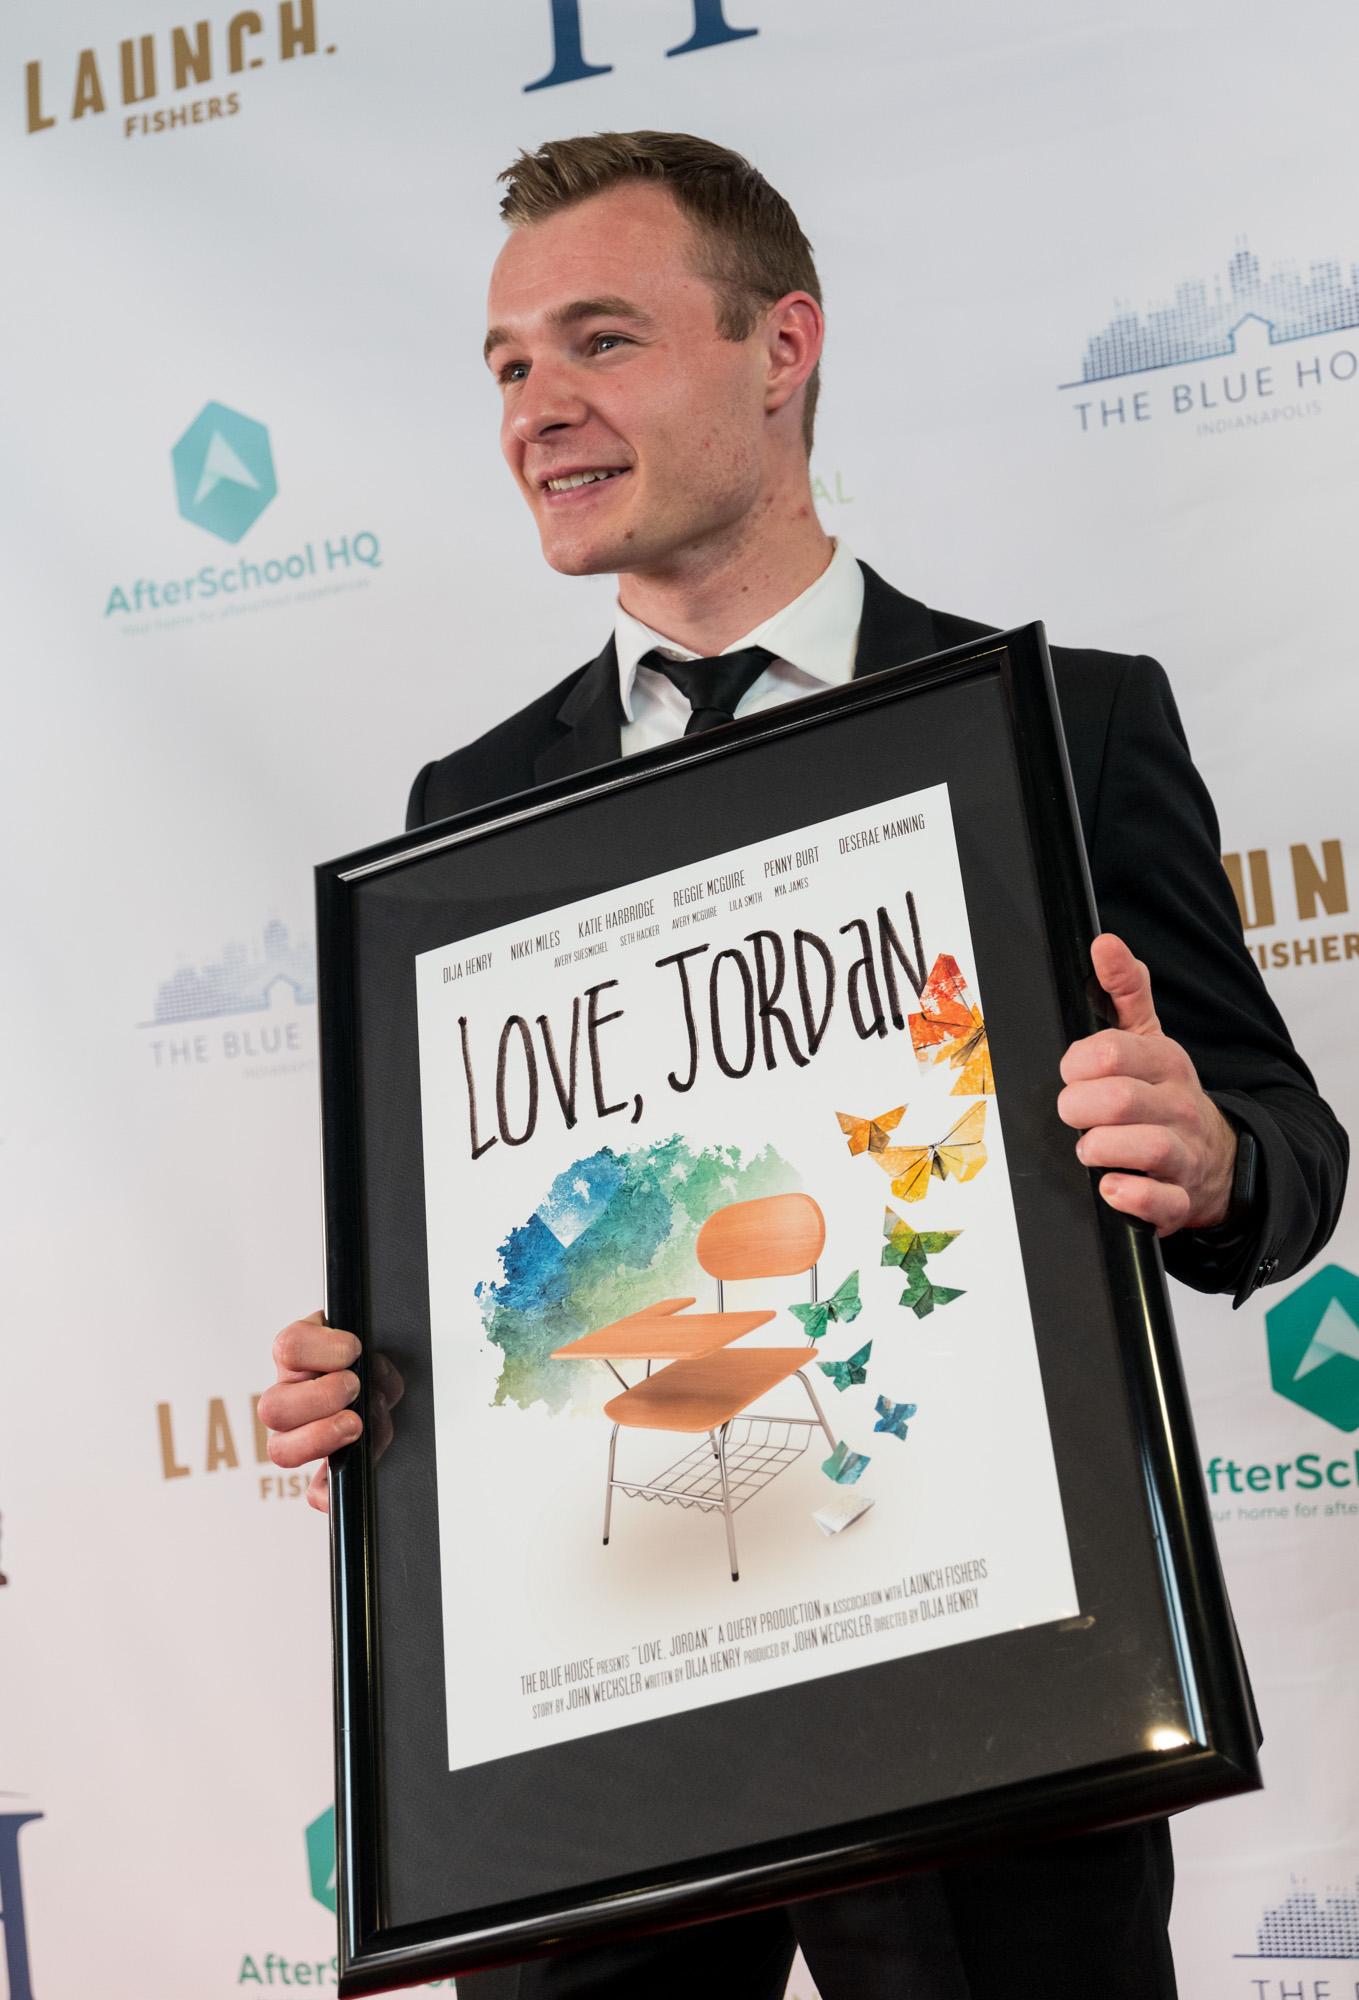 Love, Jordan Premiere, 2019  - Photo Credit to Mick Hetman Photography